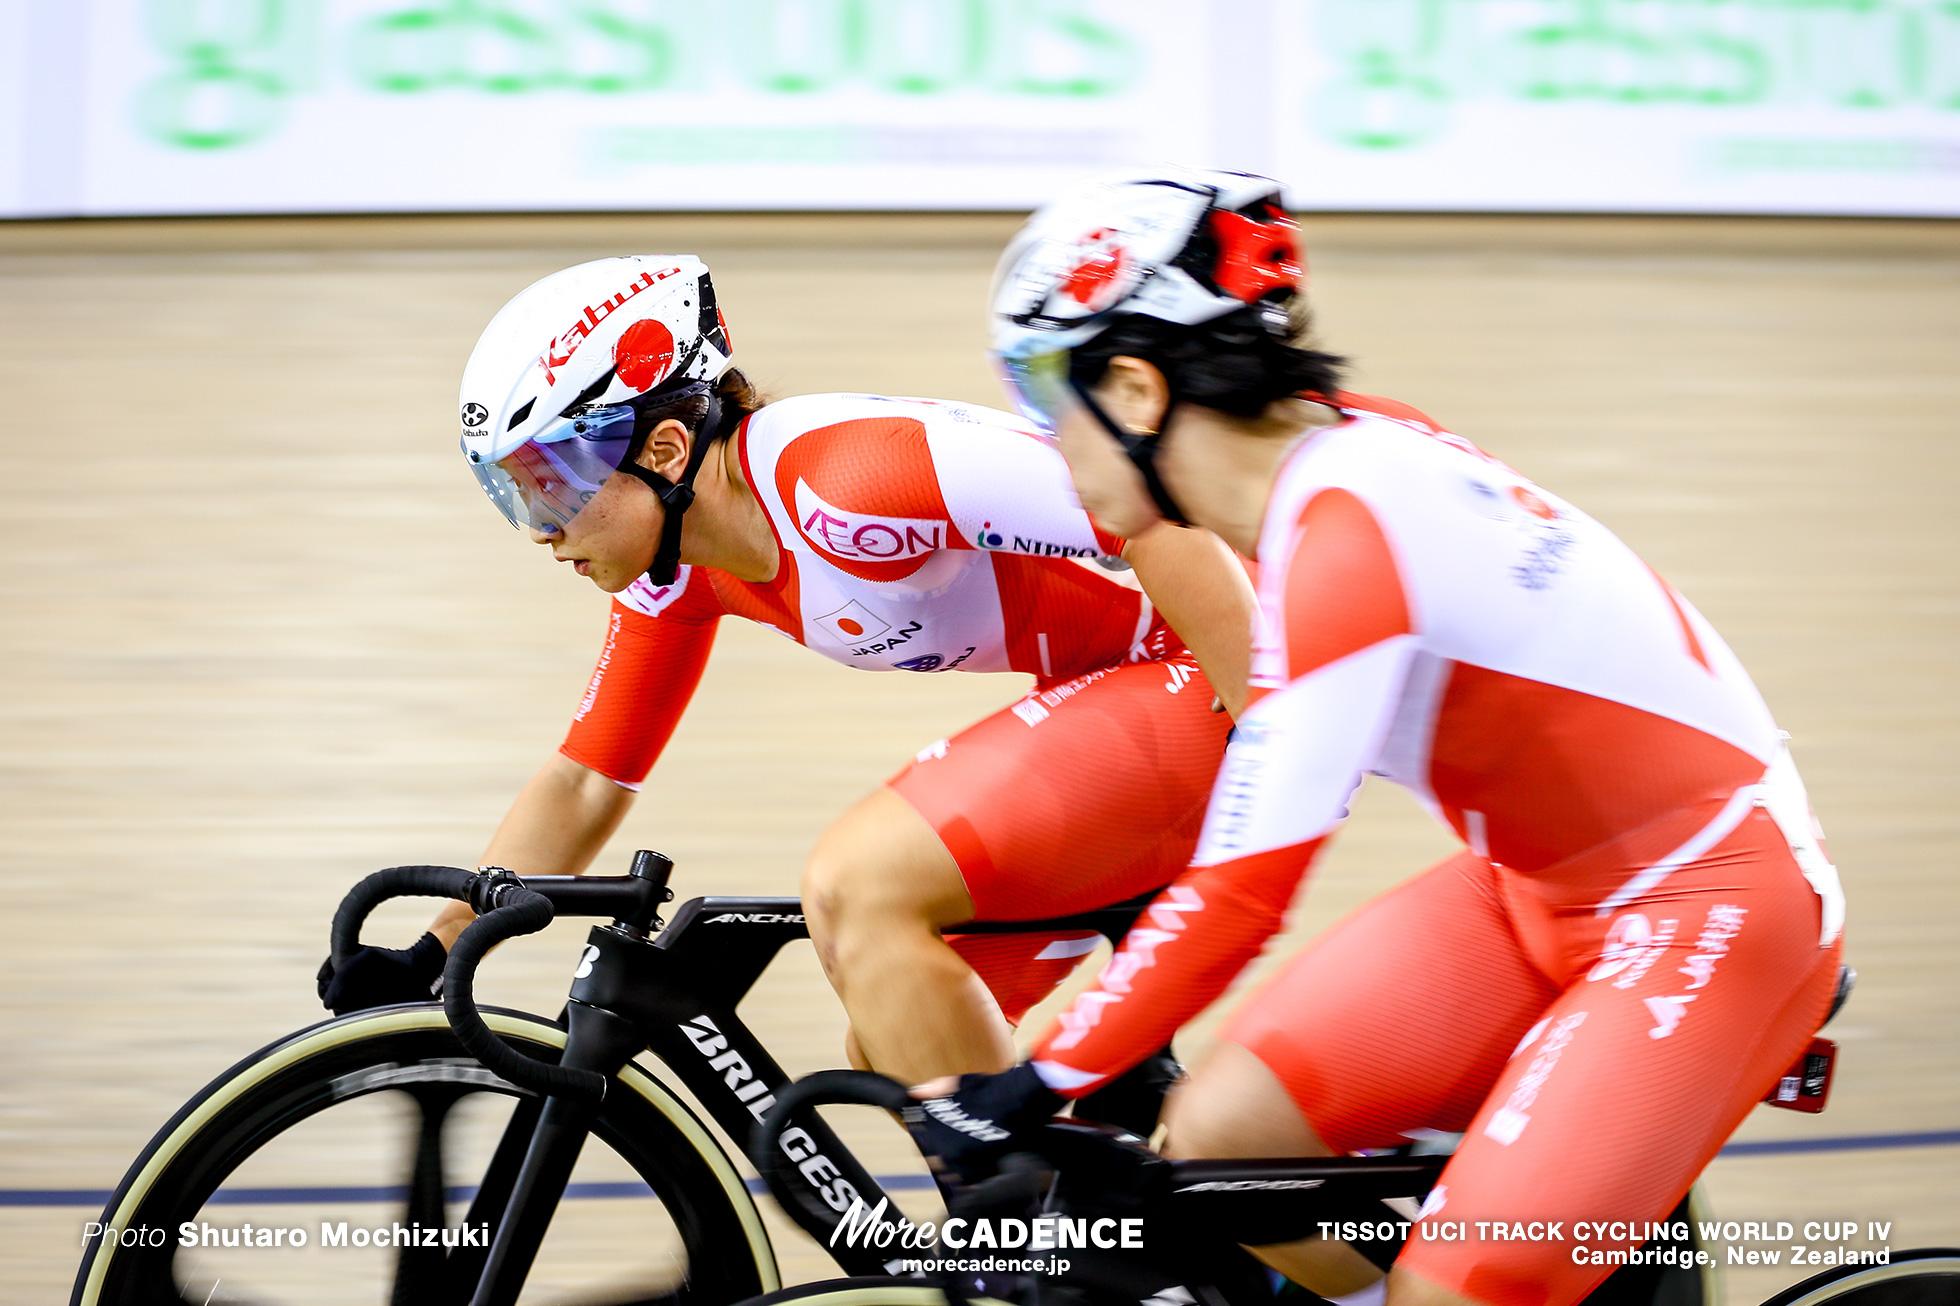 Women's Madison / TISSOT UCI TRACK CYCLING WORLD CUP IV, Cambridge, New Zealand